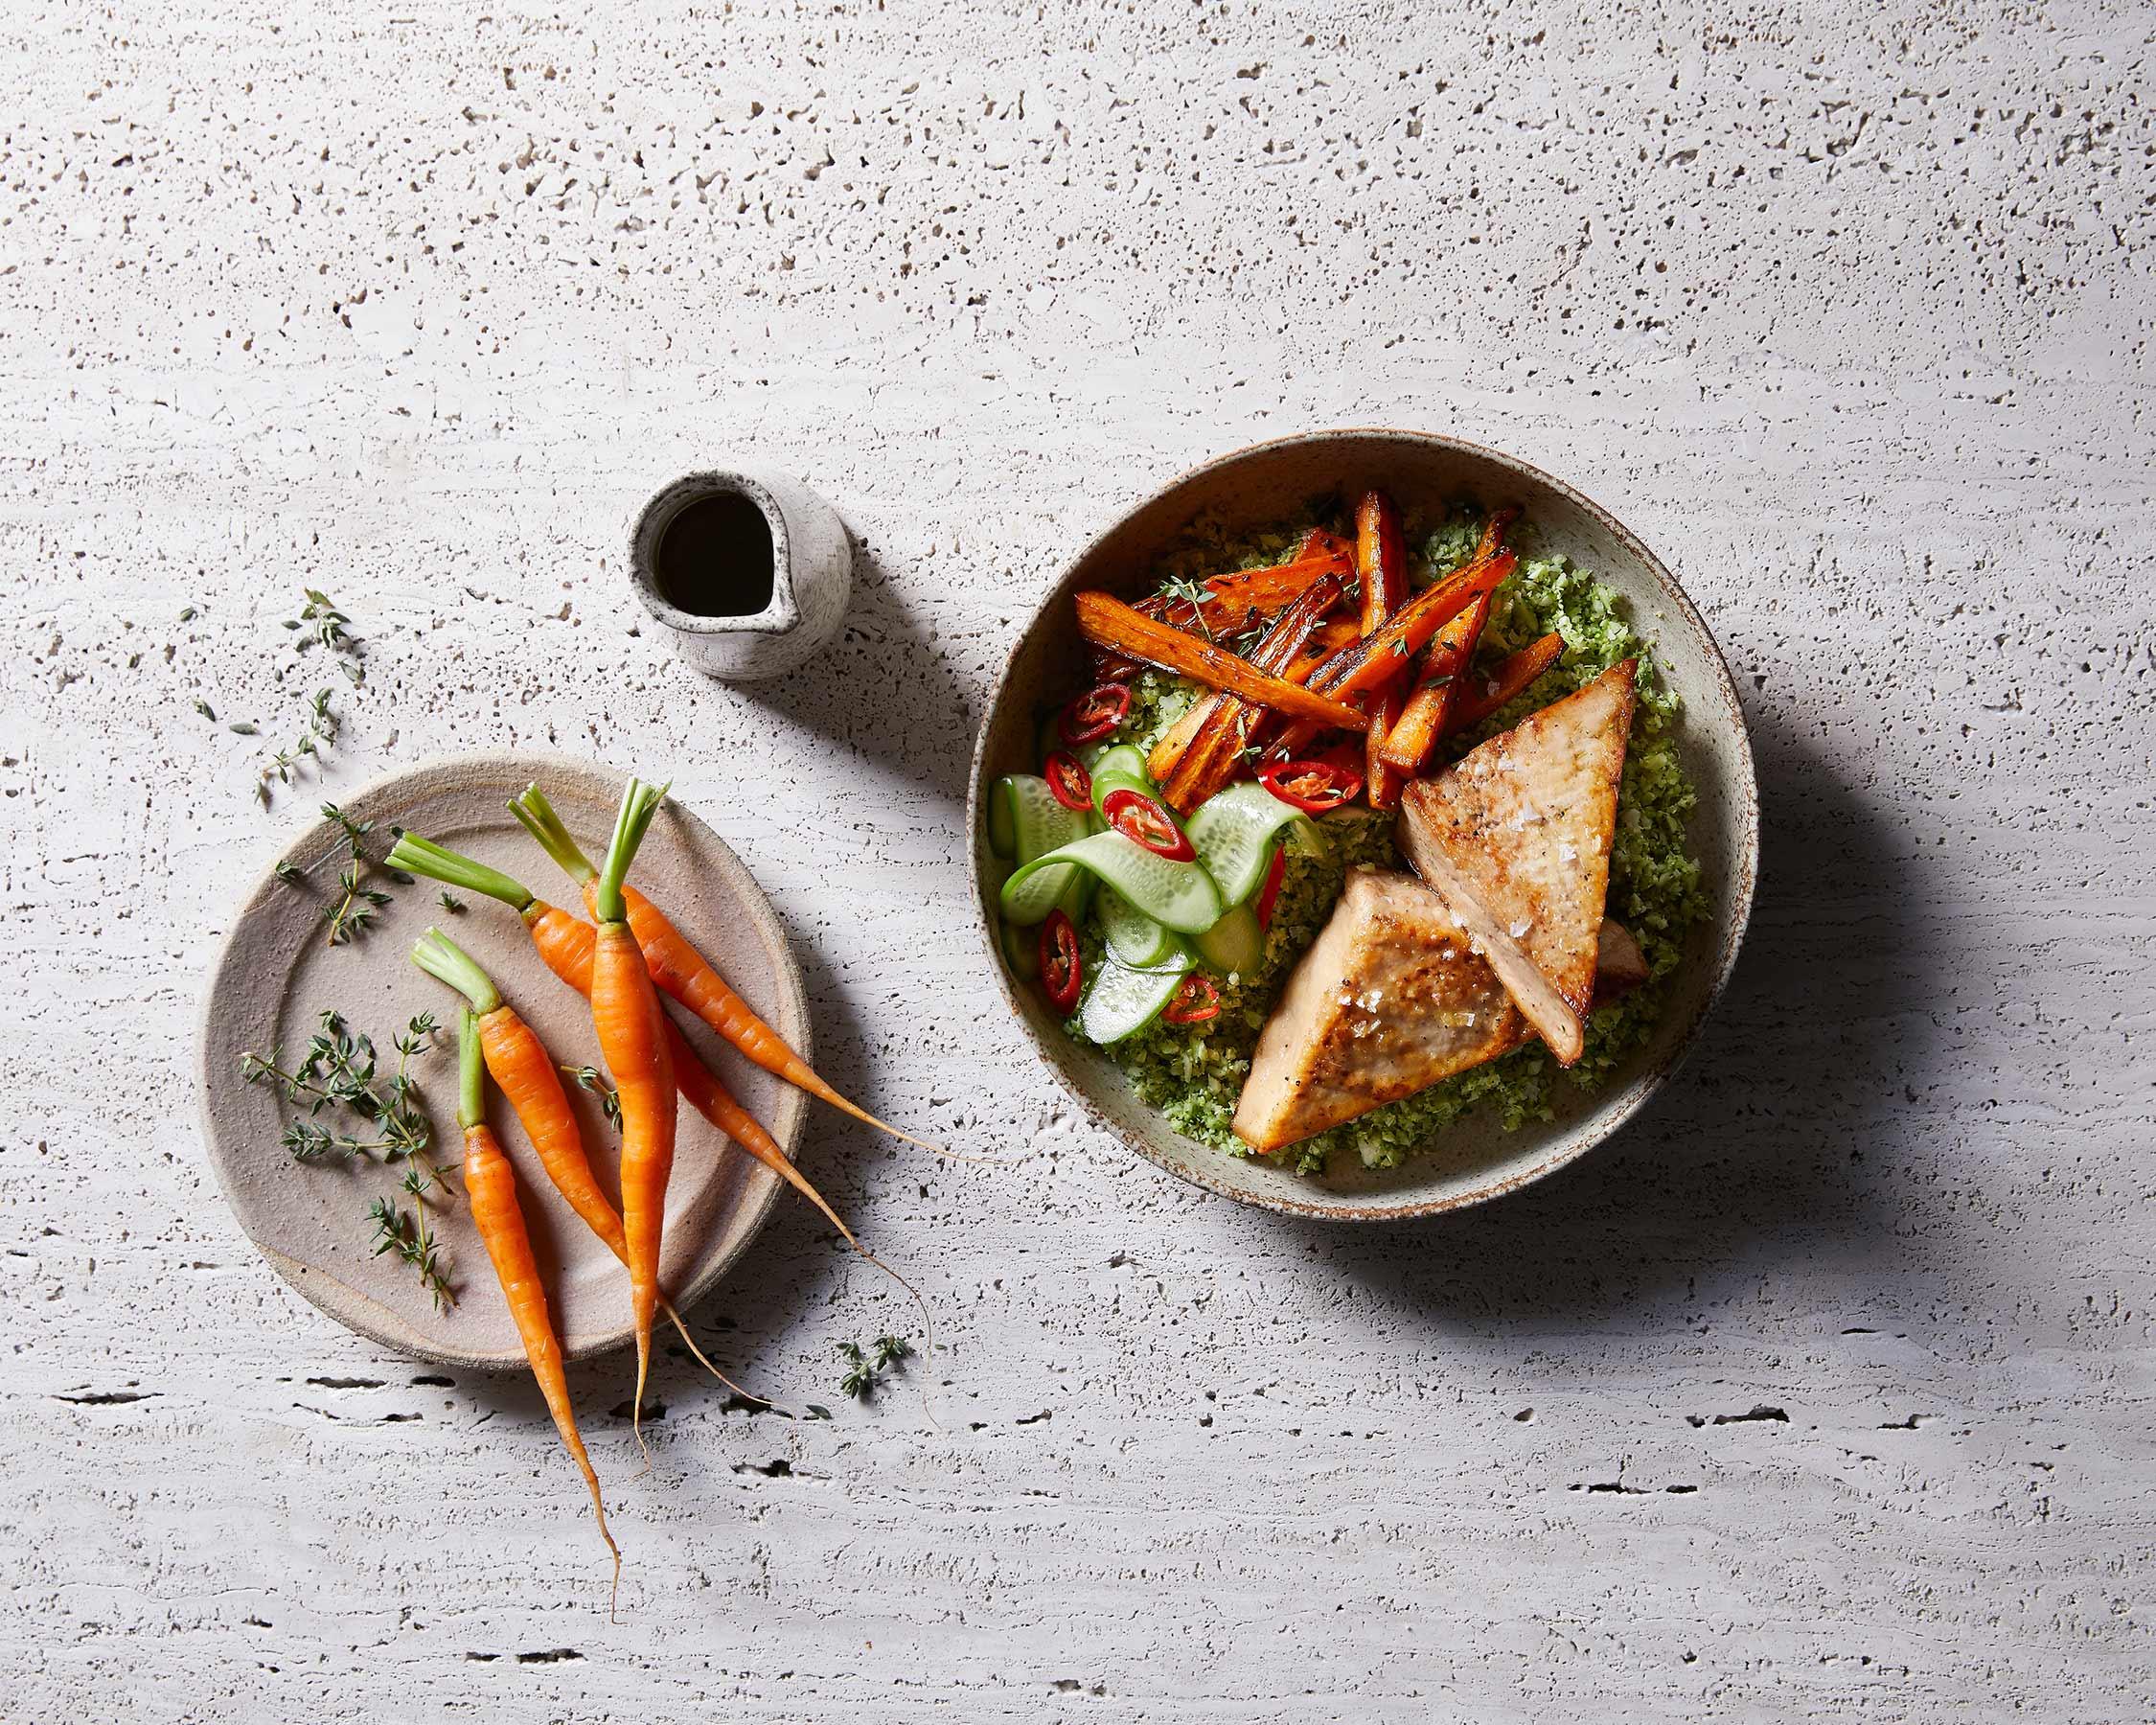 surch broccoli rice tofu